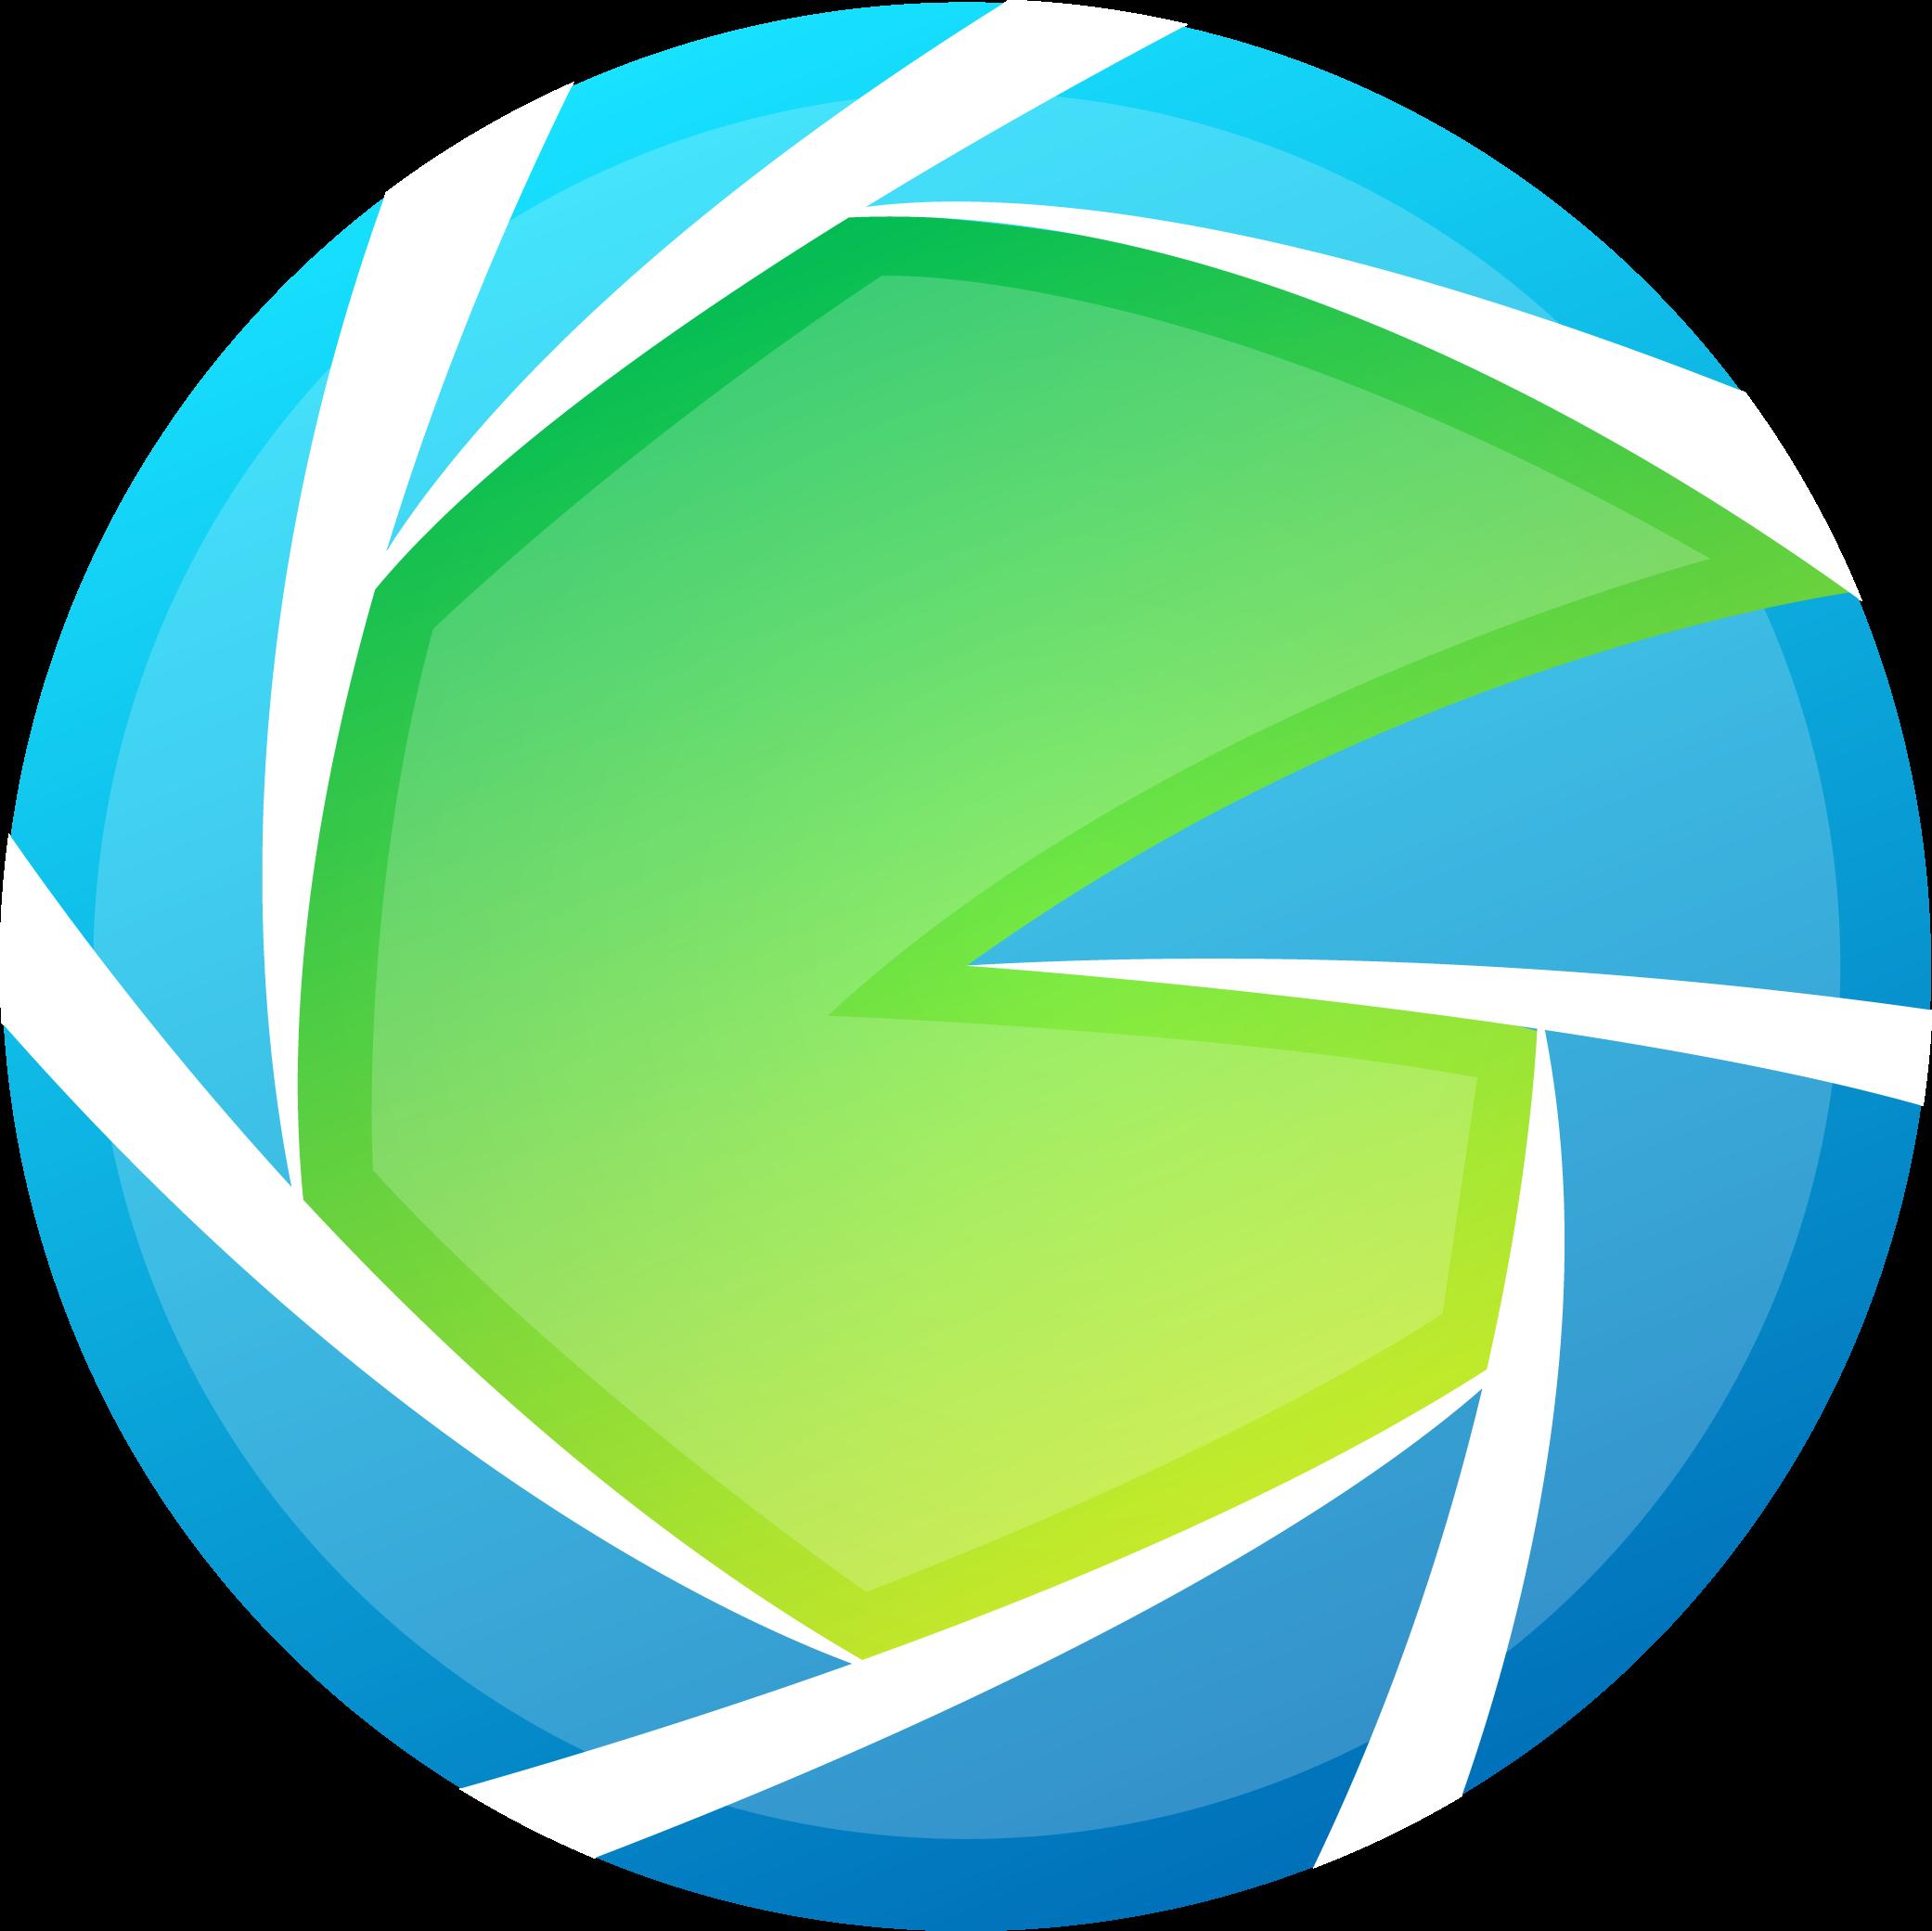 bgp_logo_2015.png